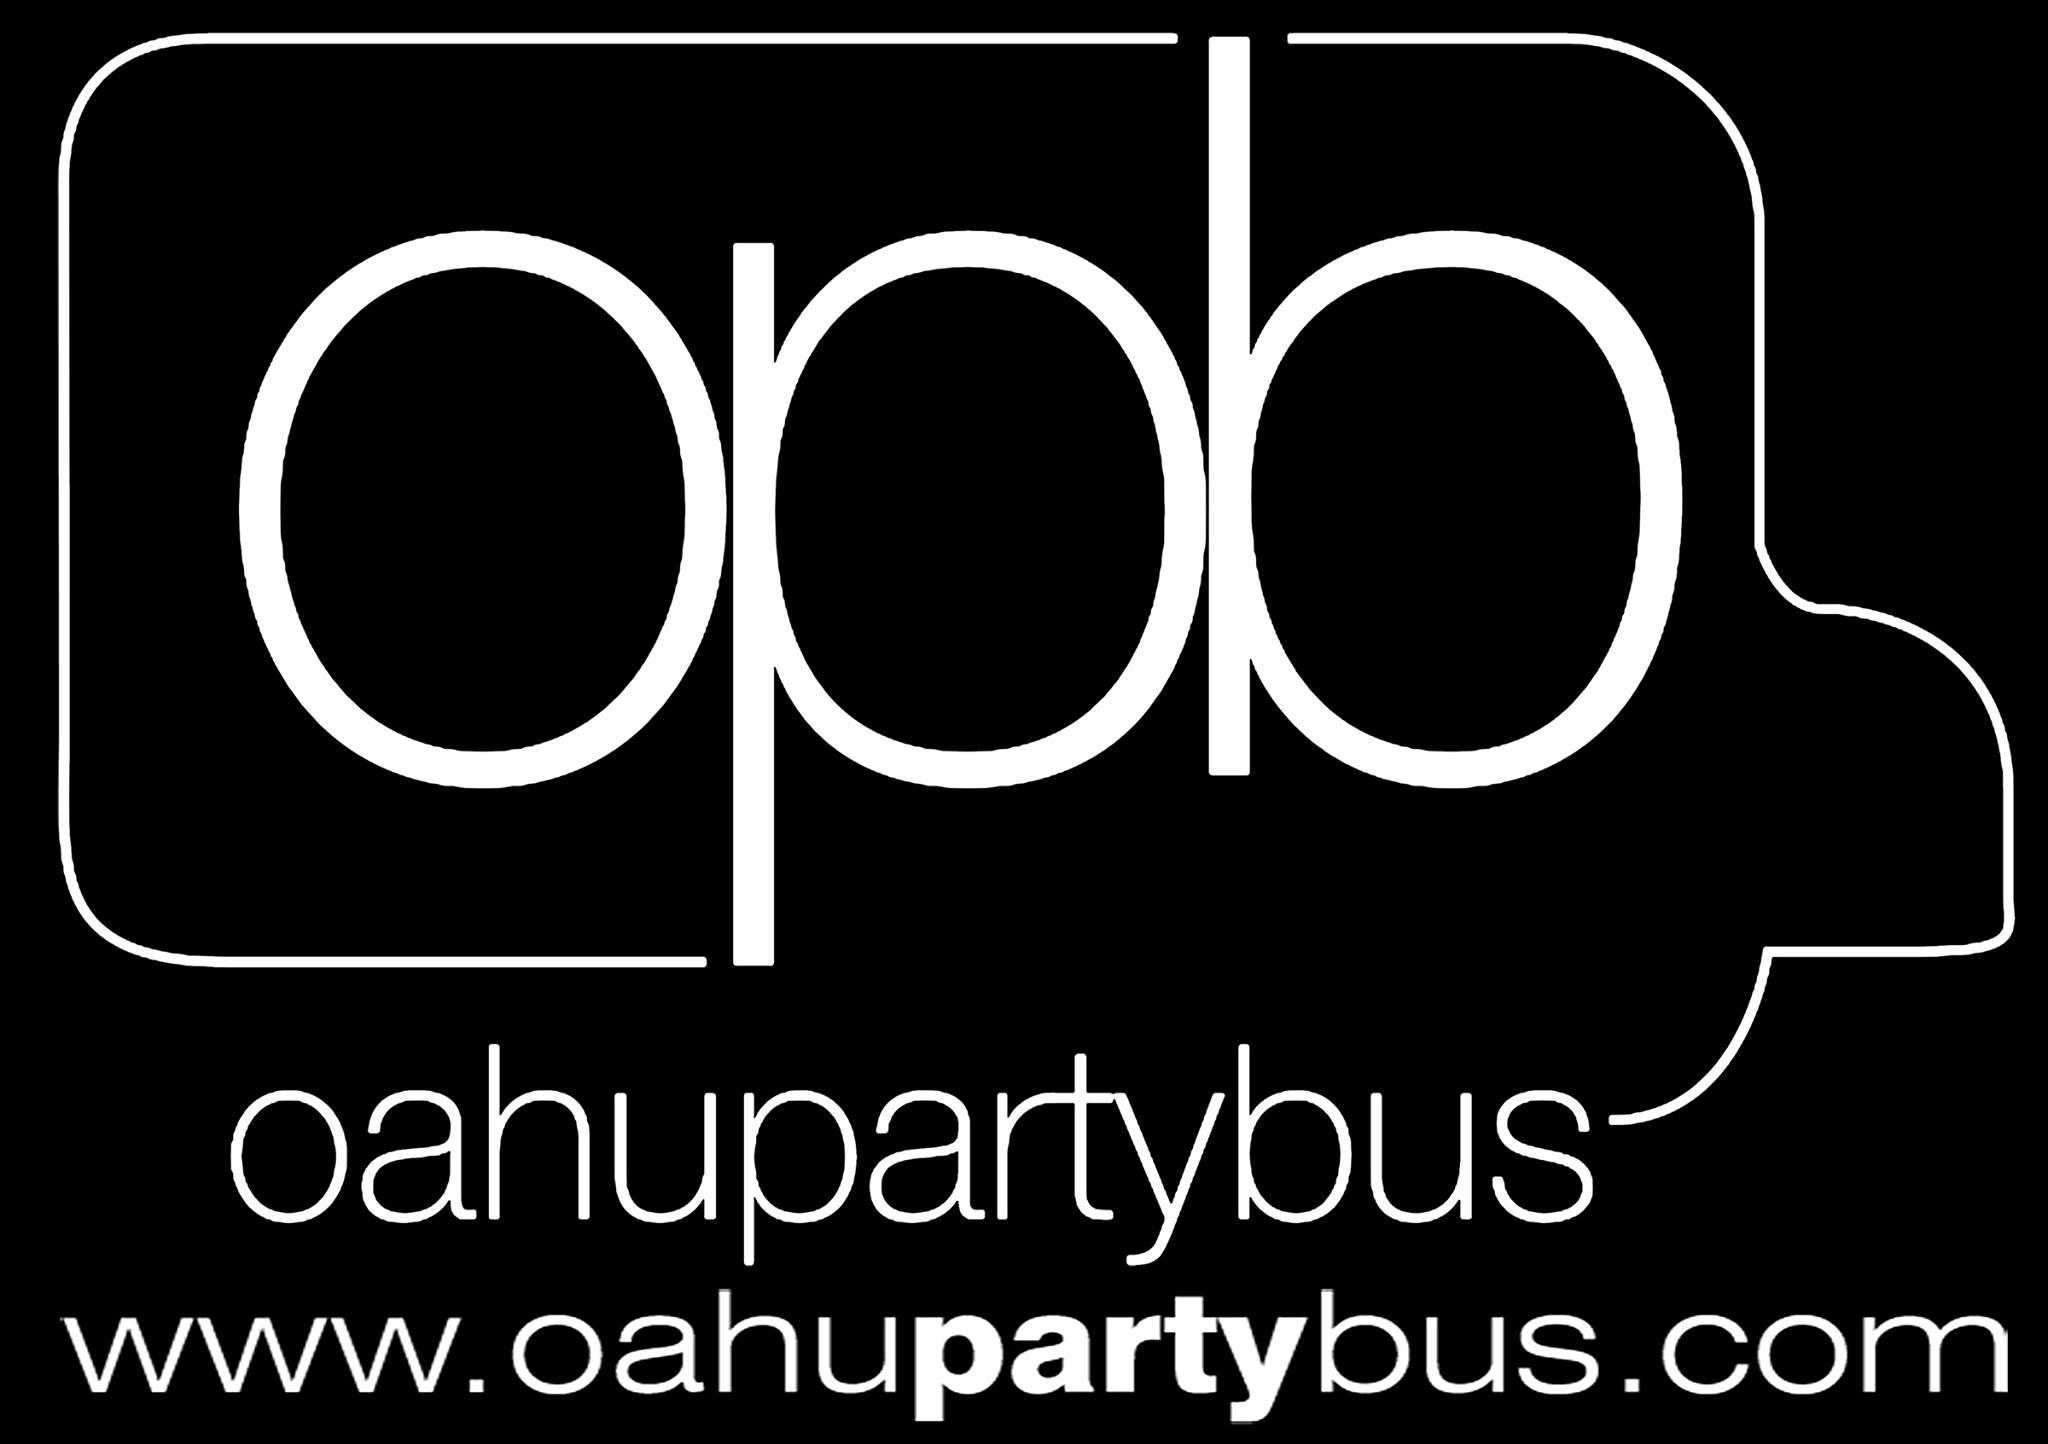 oahu party bus logo